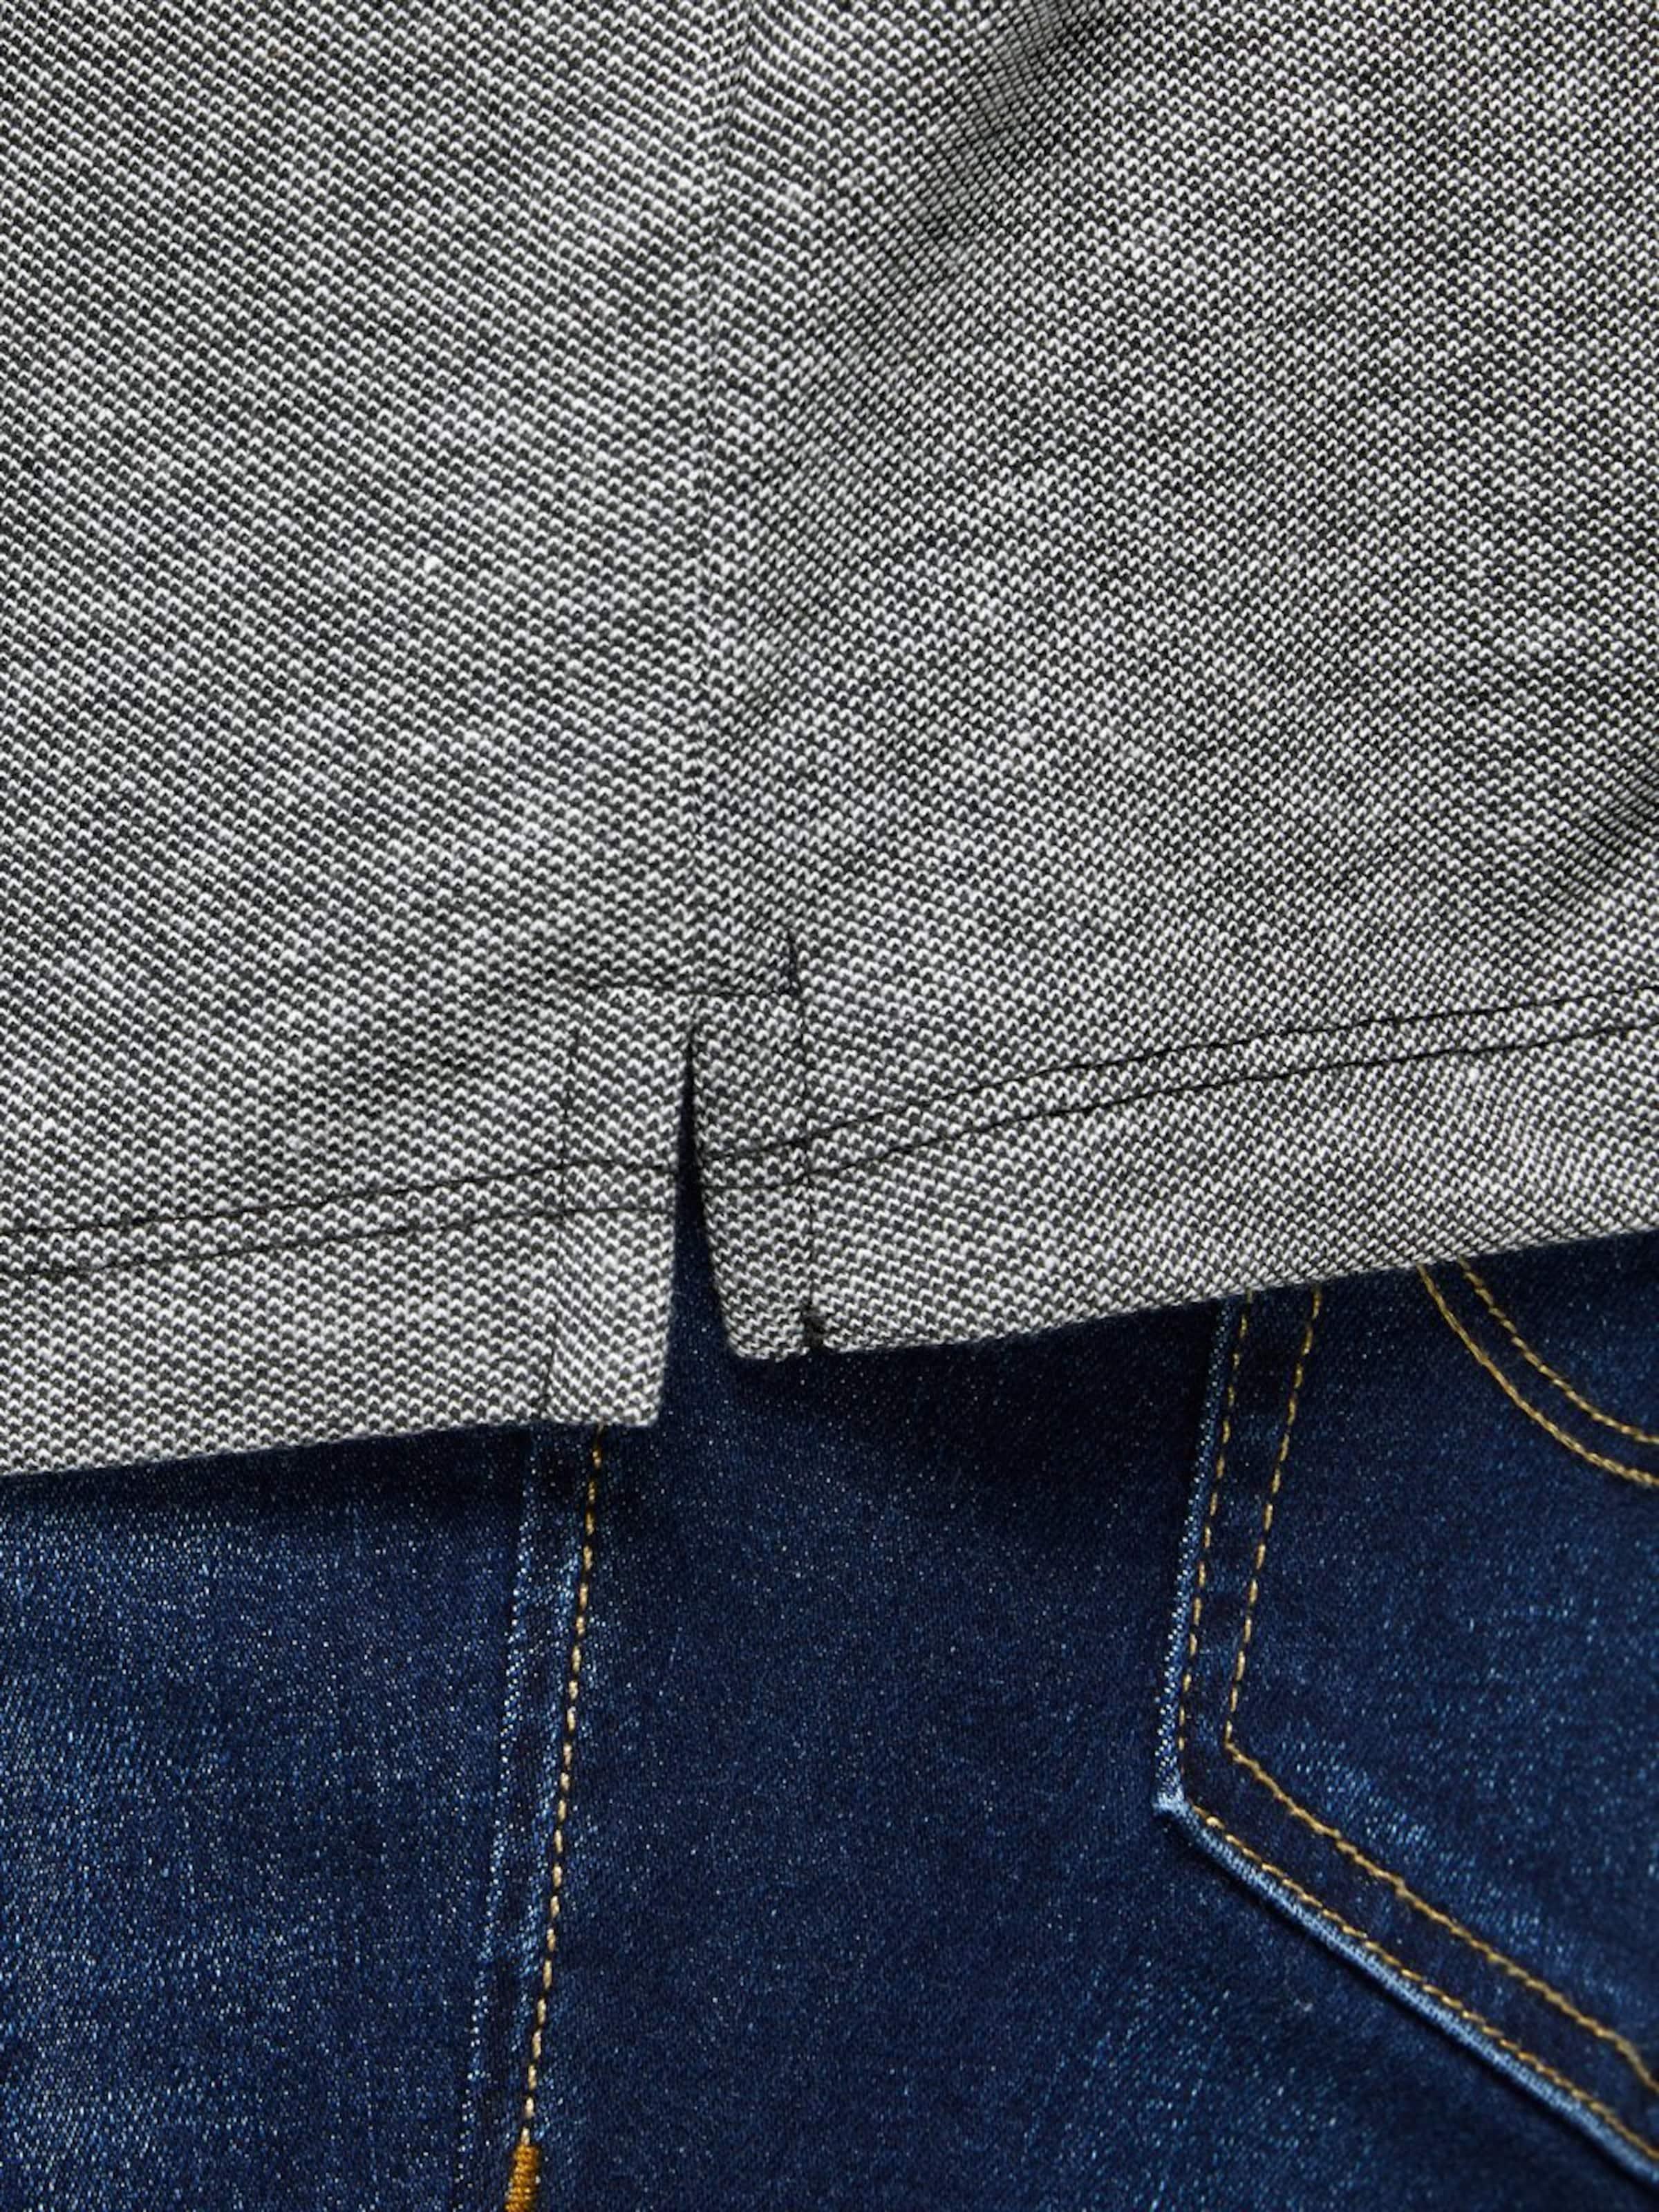 Poloshirt In Jones Grau Jackamp; Jackamp; 35AjcLRq4